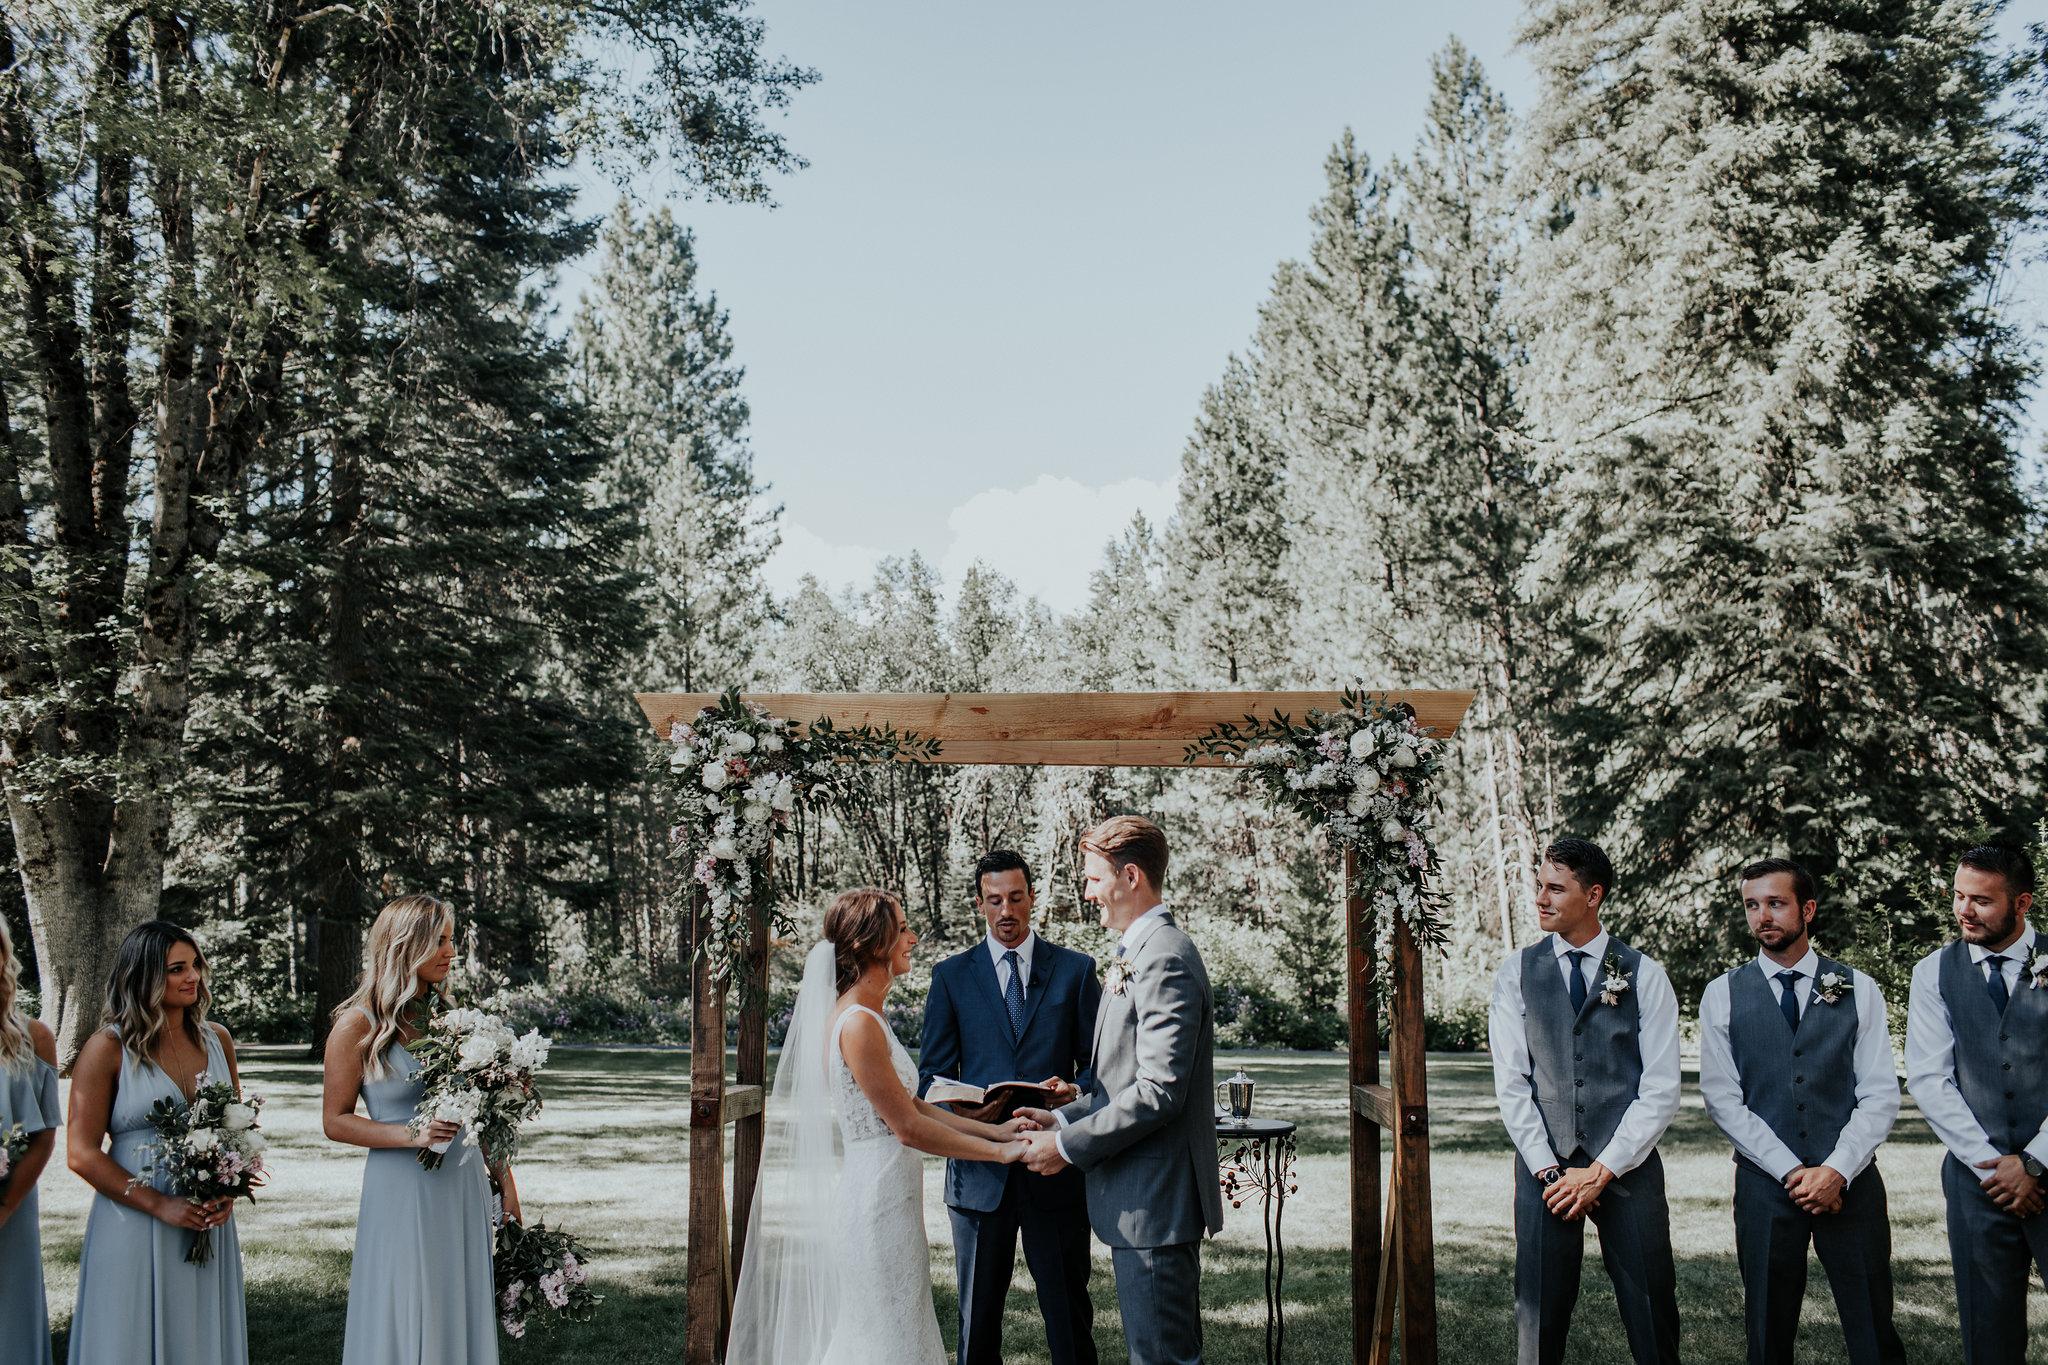 hannah-merritt-photography-porter-wedding-mccloud-guest-house-mt-shasta-california-531.jpg